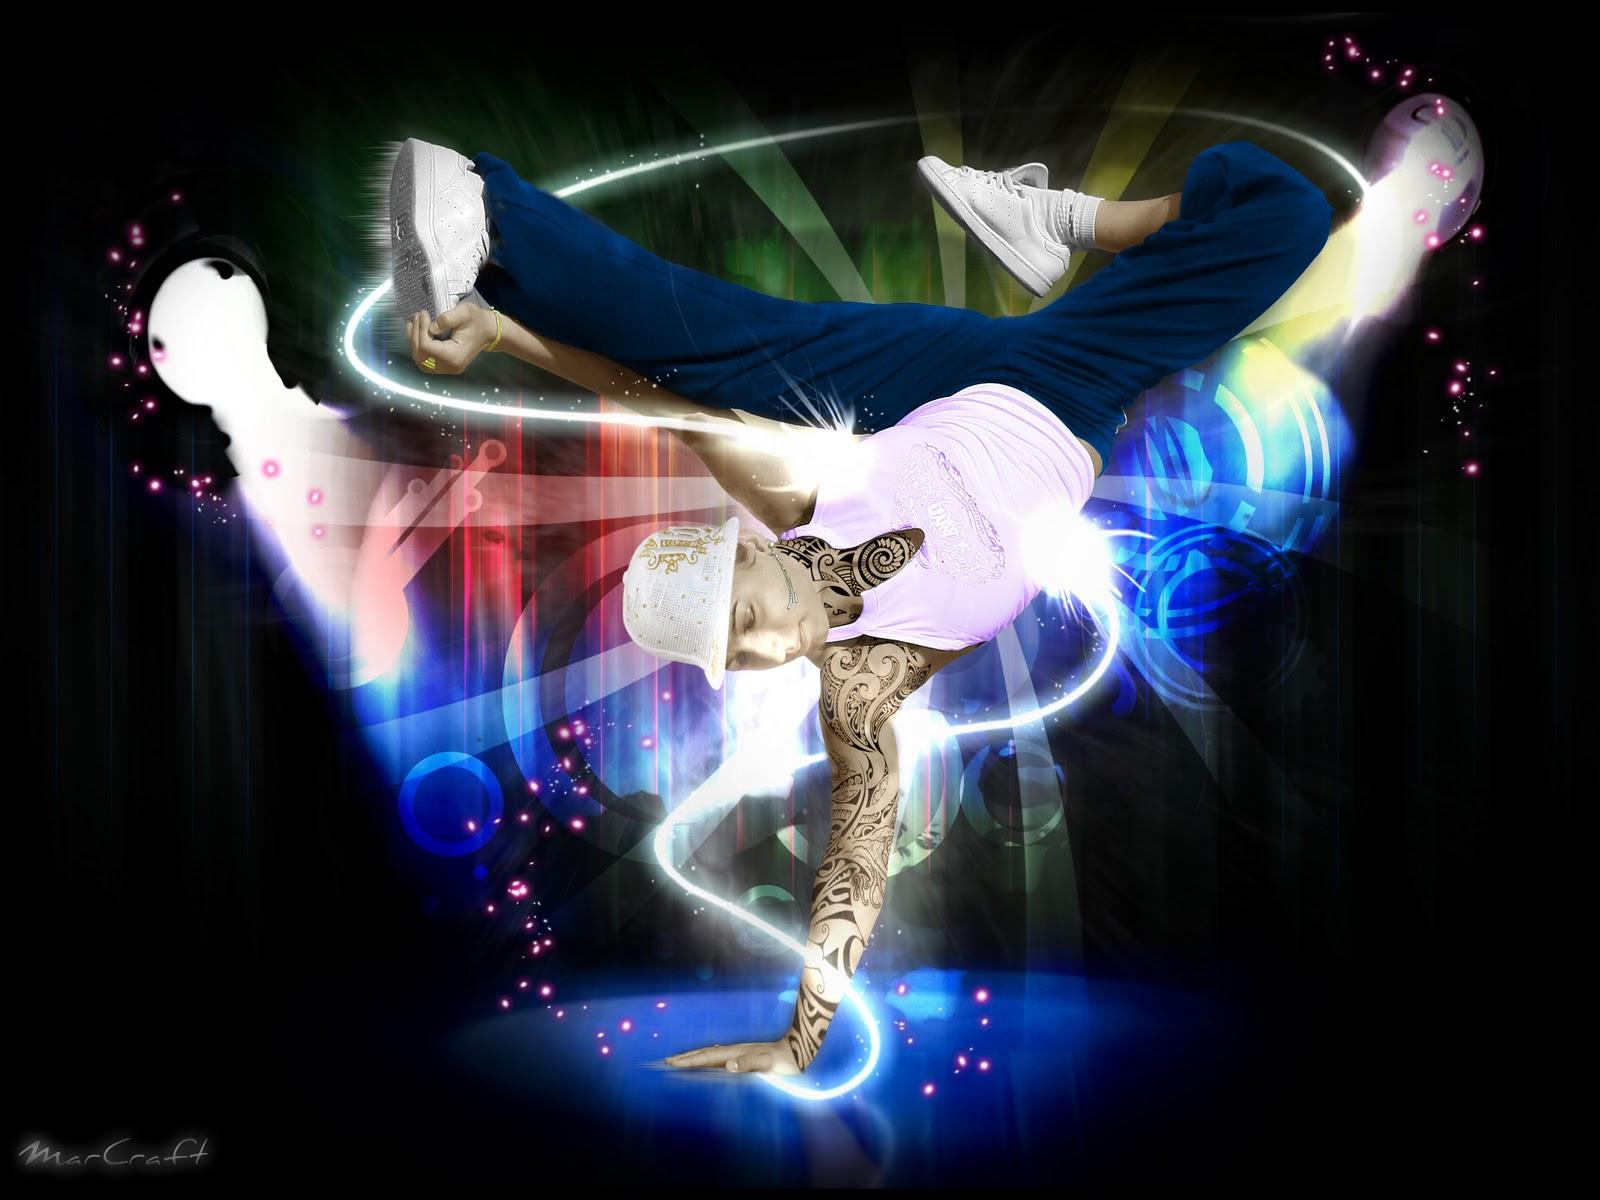 http://3.bp.blogspot.com/-S9-2nuVyjlc/TqIxpqHuhsI/AAAAAAAABYI/cnj1_3Y8maQ/s1600/wallpaper+dance-Hip-Hop.jpg